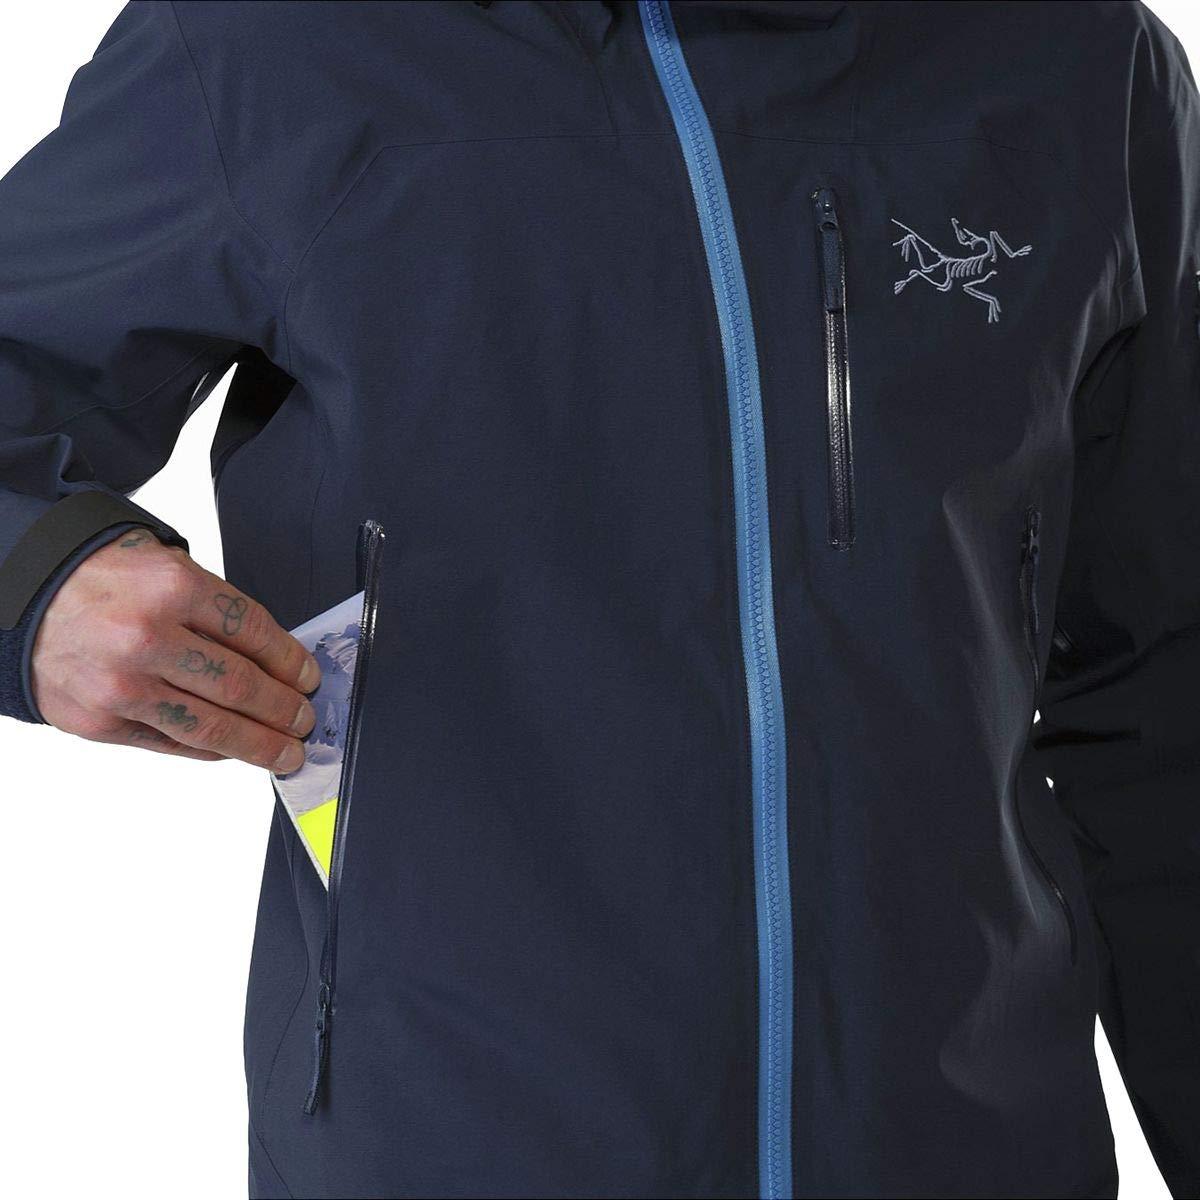 Amazon.com: Arcteryx Sidewinder - Chaqueta para hombre ...